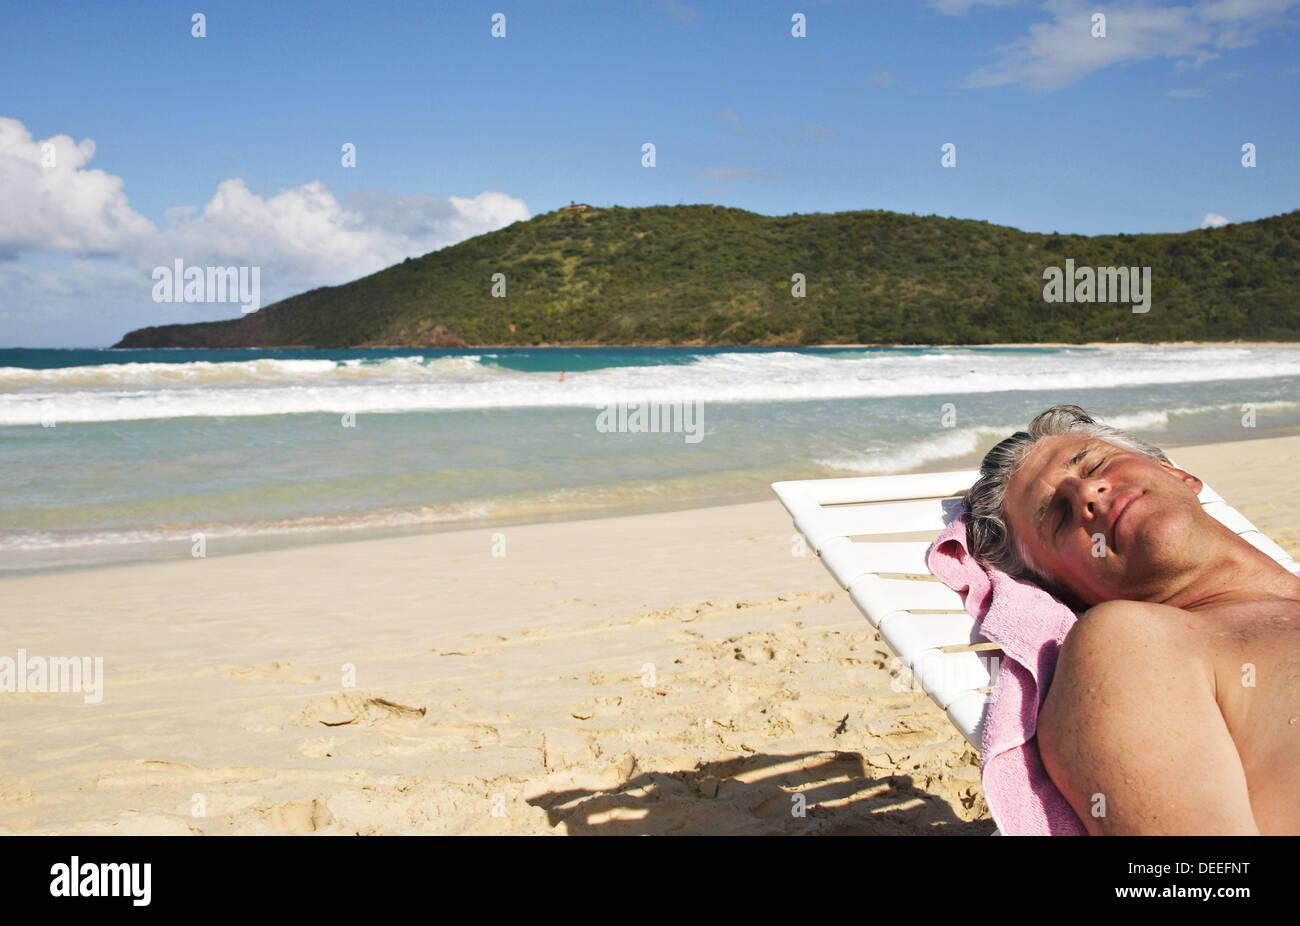 flamenco beach beautiful strong waves man on white chaise lounge